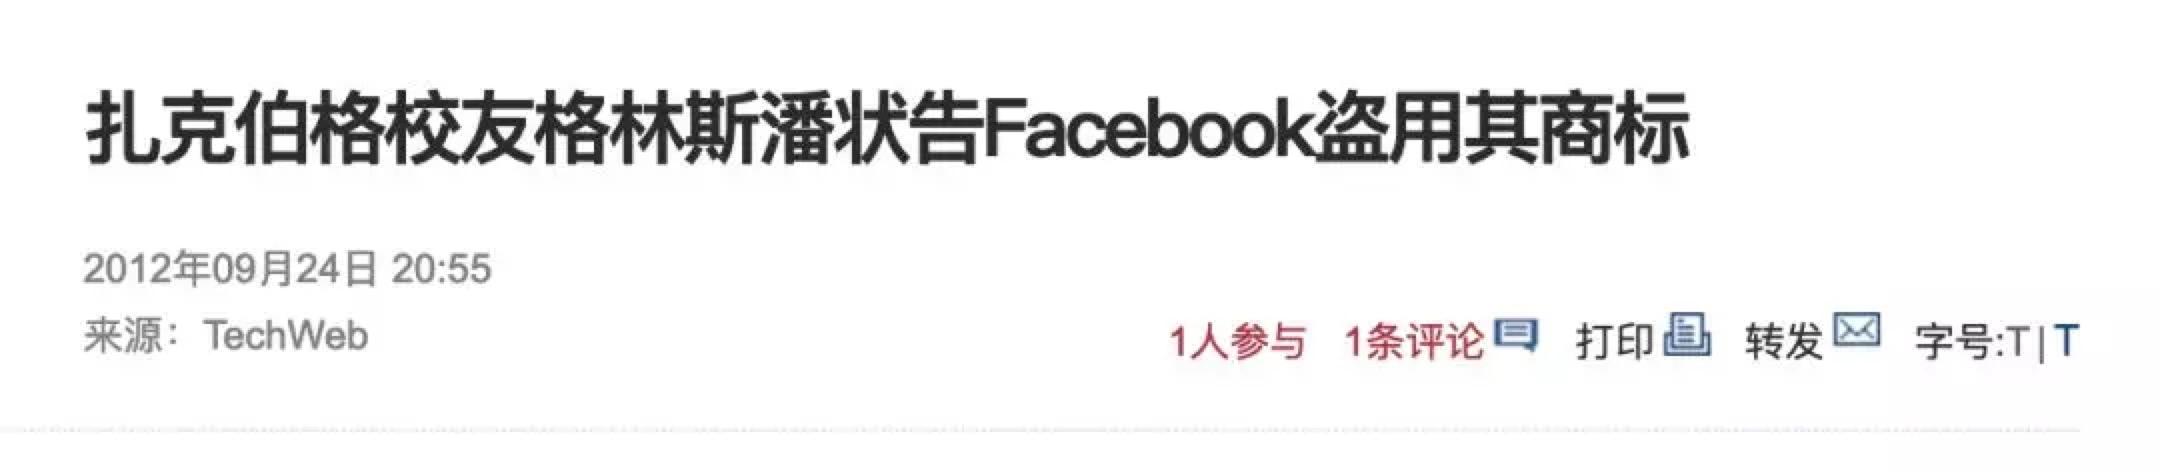 Facebook数据造假?多家中国公司涉及!-互联网之家